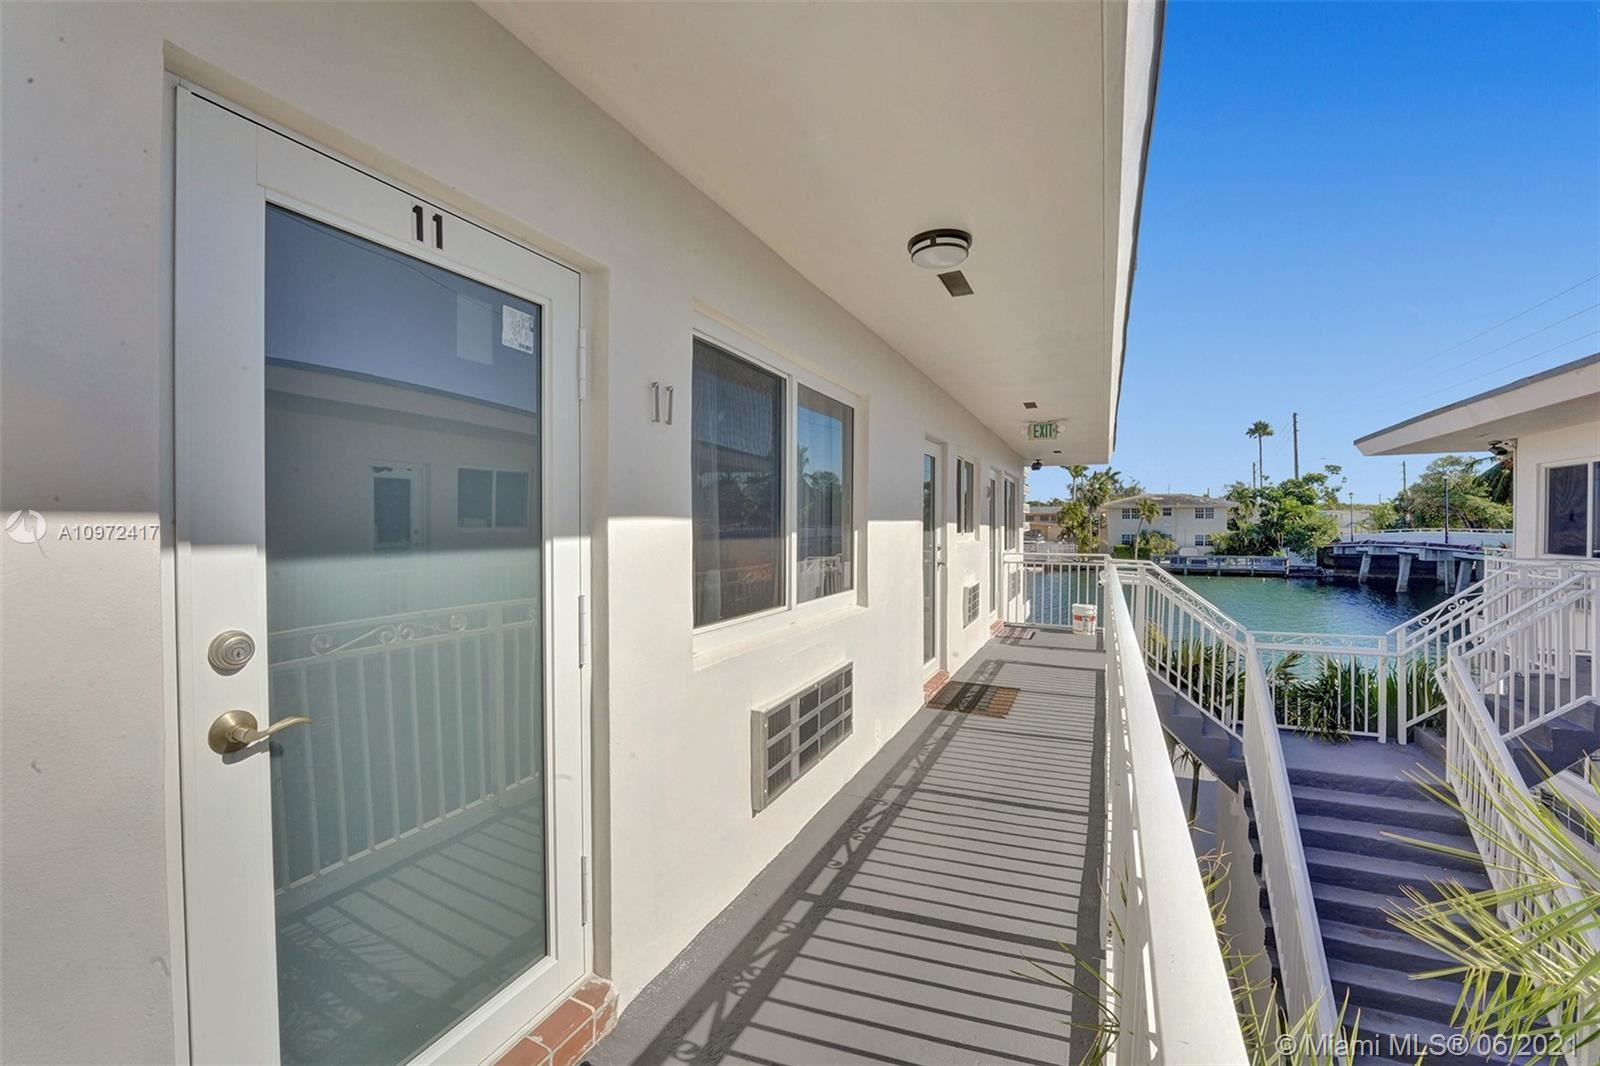 8509 Crespi Blvd #11, Miami Beach, FL 33141 - #: A10972417